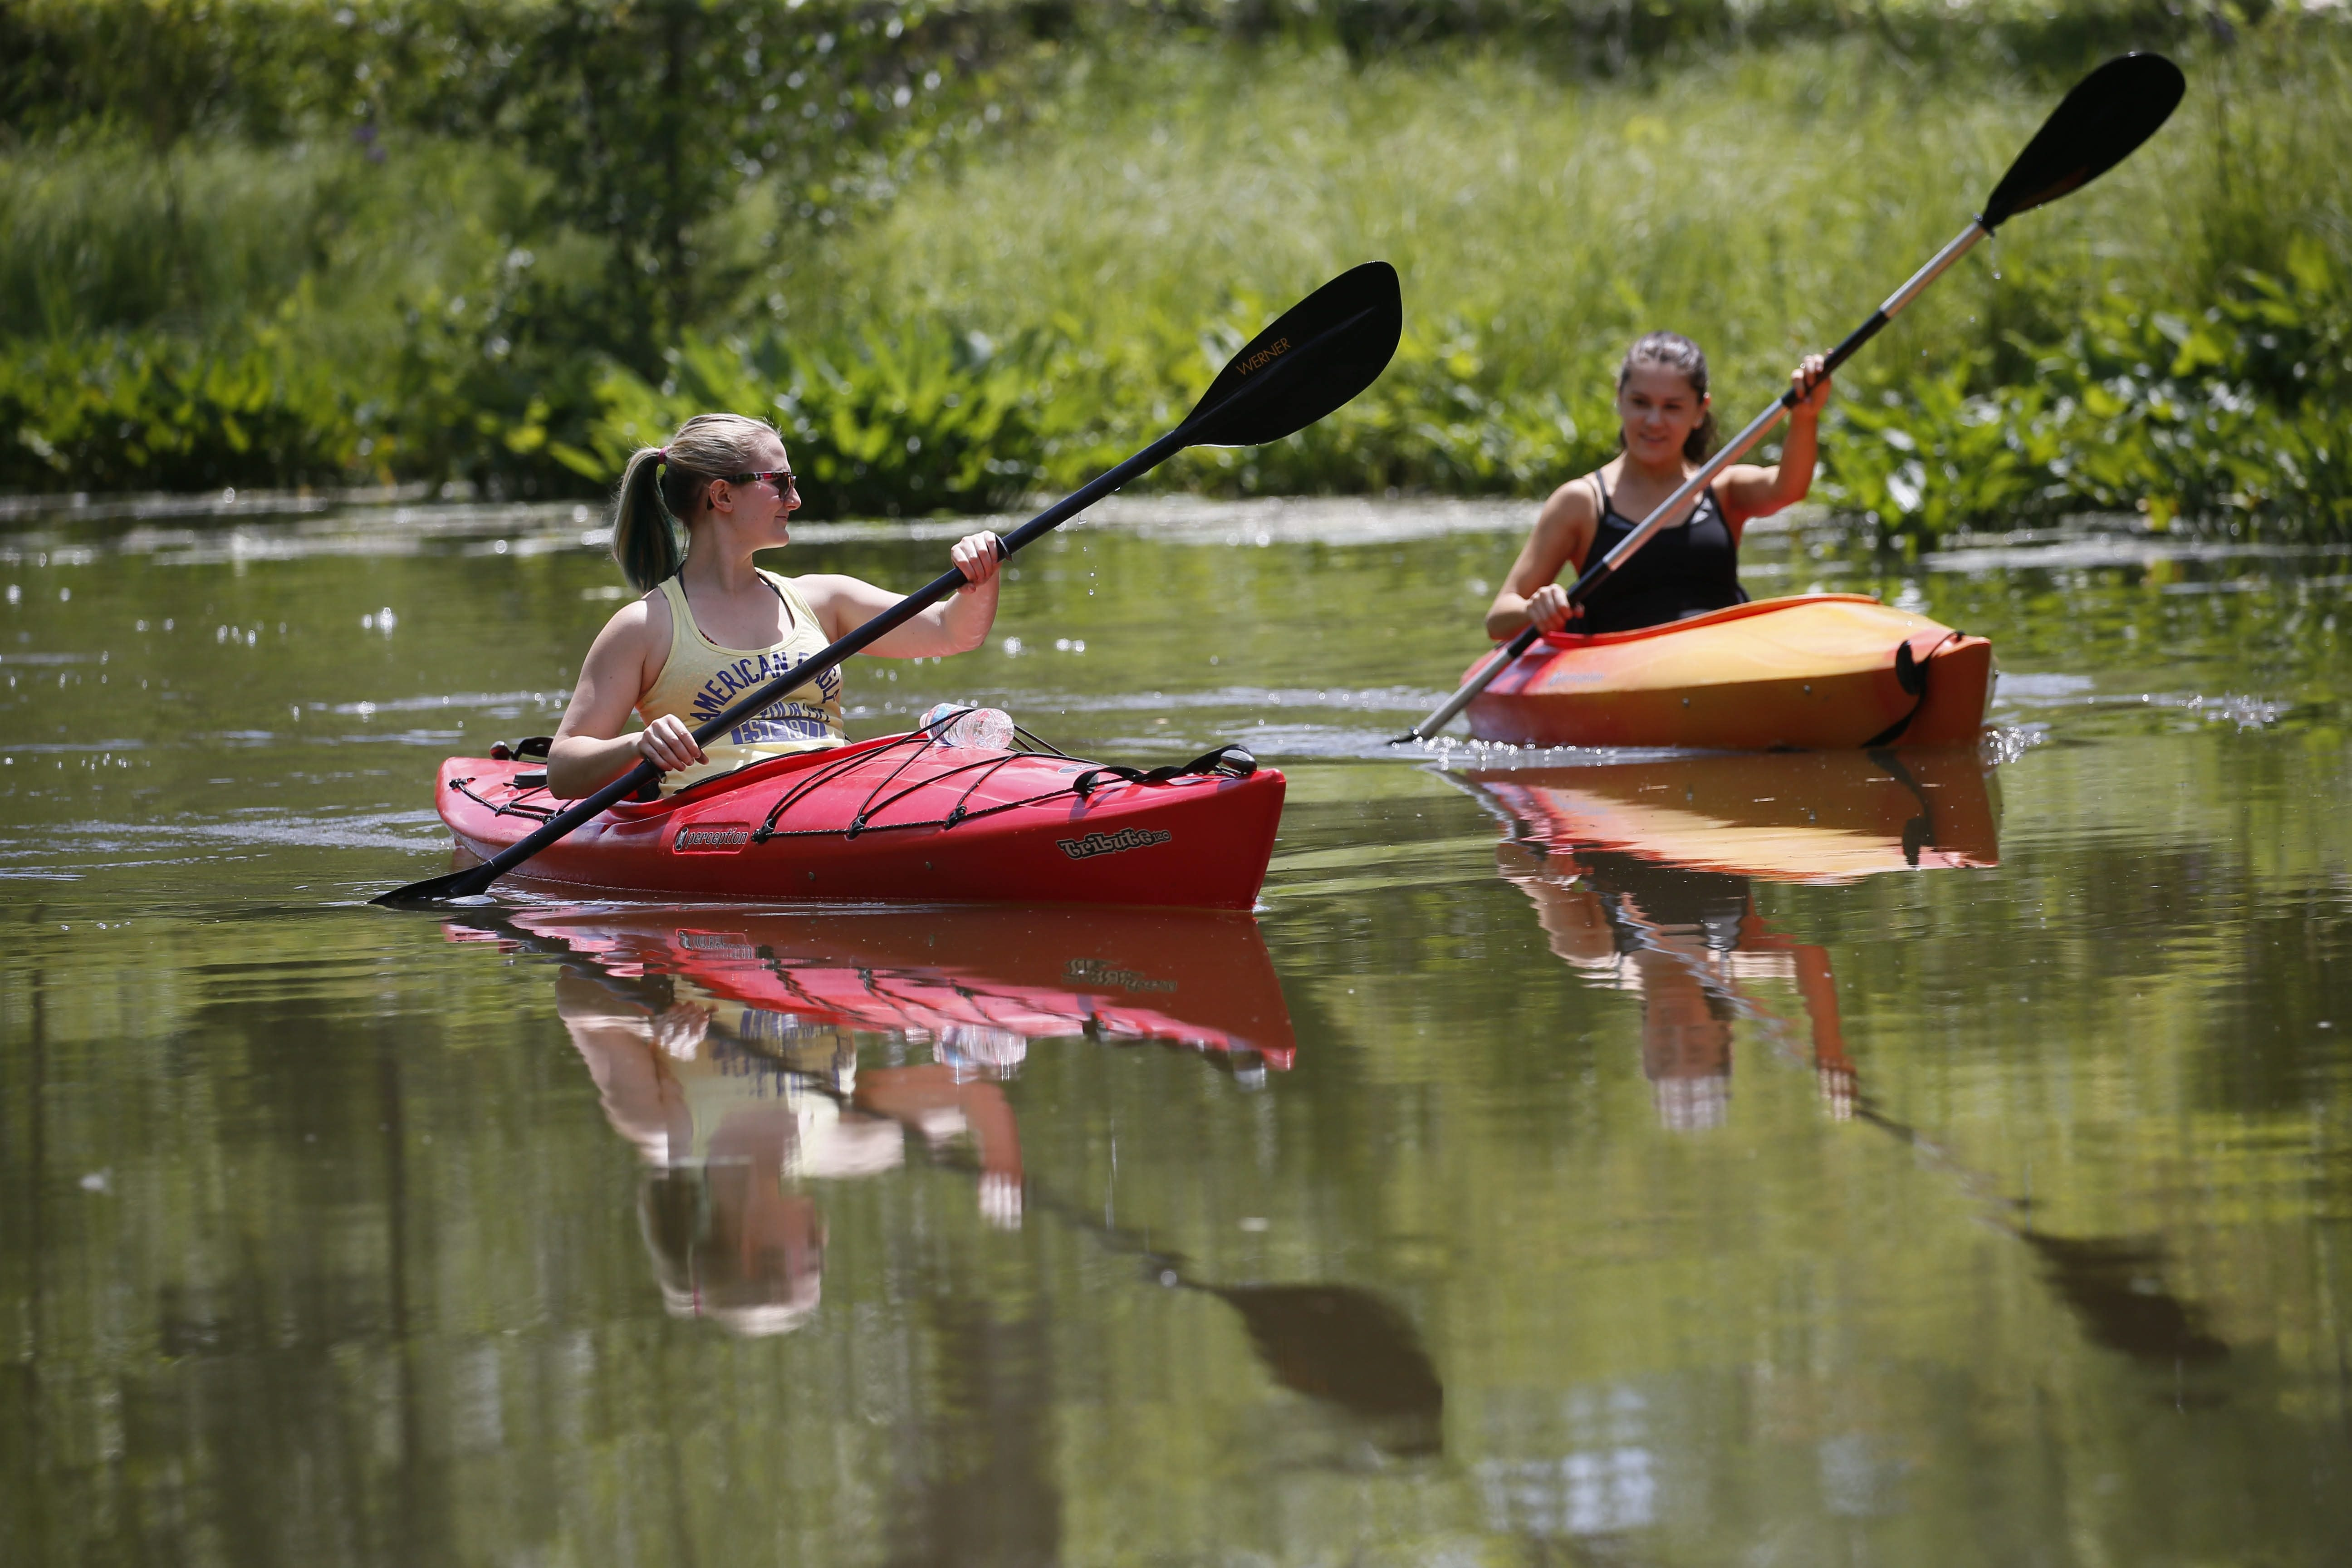 Steph Aronica, left, and Jackie Nusstein of Grand Island paddle kayaks down Woods Creek in Buckhorn Island State Park, last summer. (Derek Gee/Buffalo News)